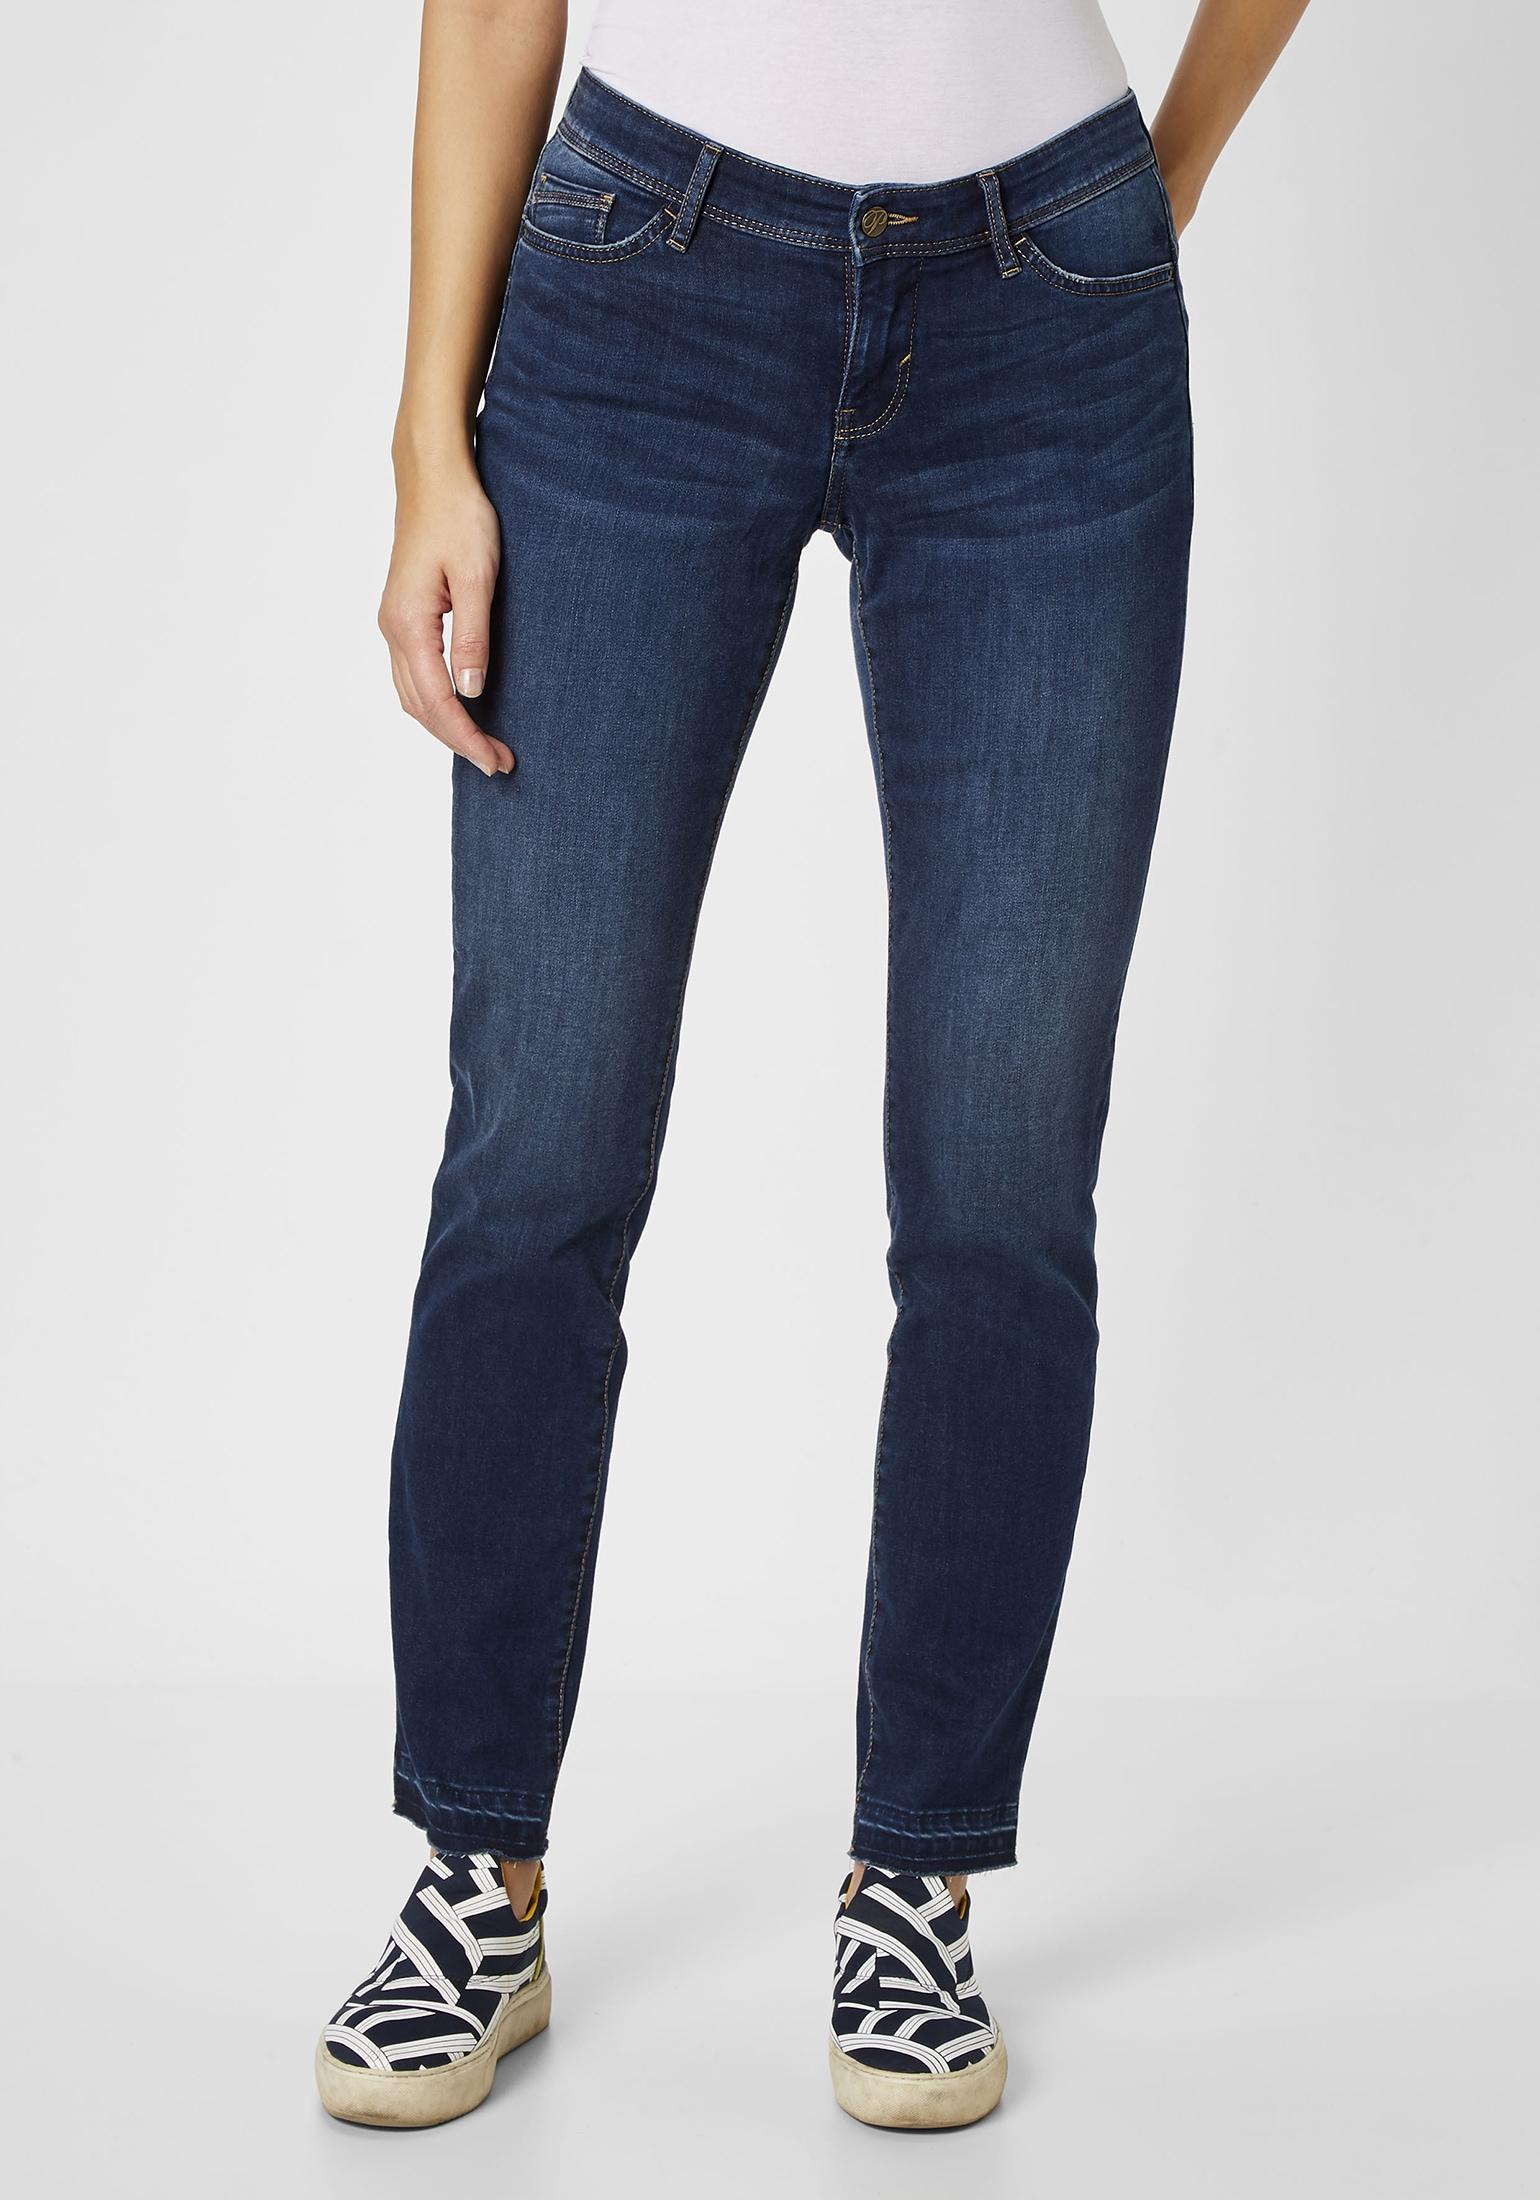 Paddock's 5-Pocket Hose mit Light Denim PINA   Bekleidung > Hosen > 5-Pocket-Hosen   PADDOCK'S